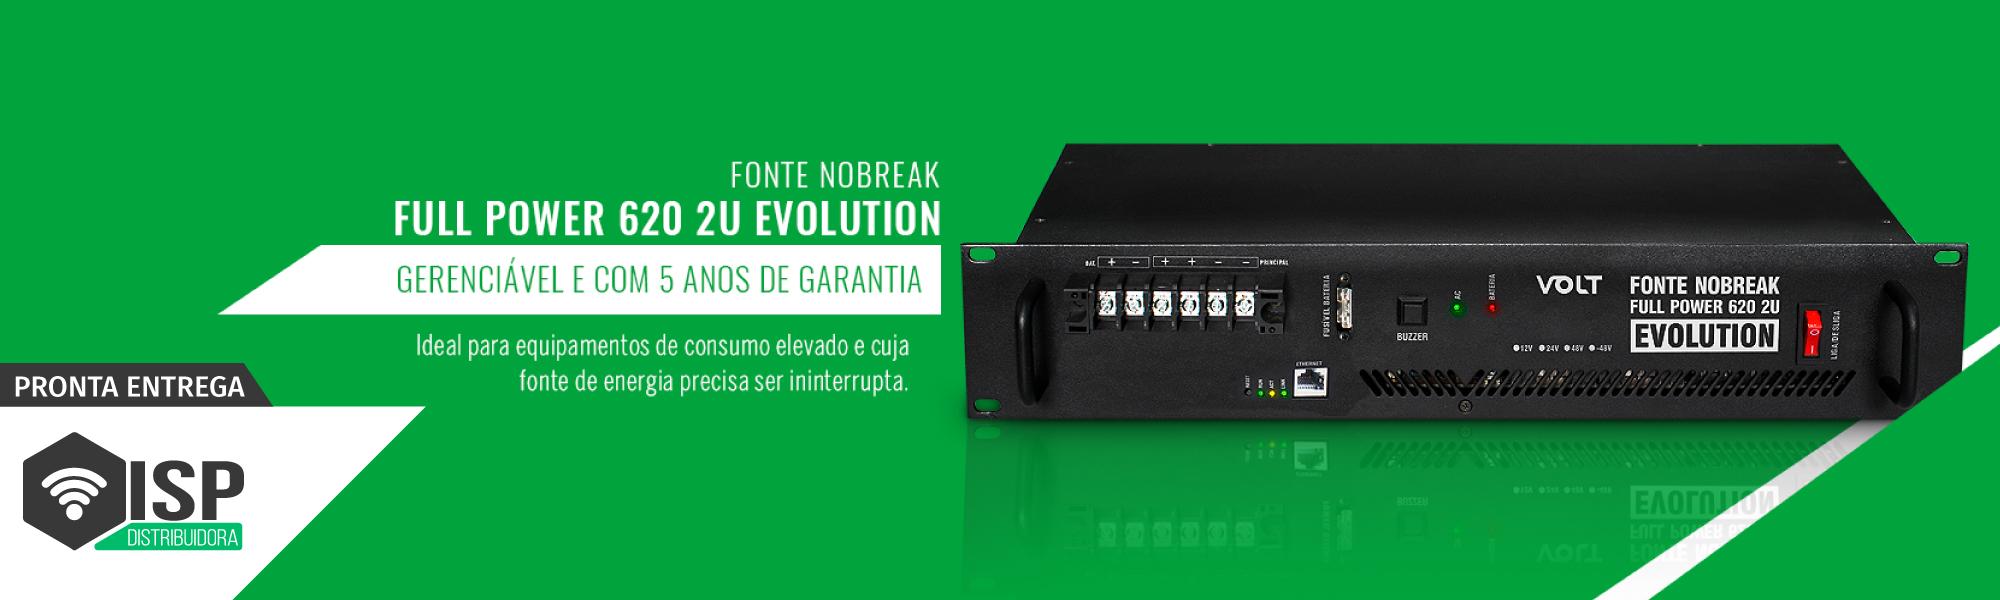 FullPower 620